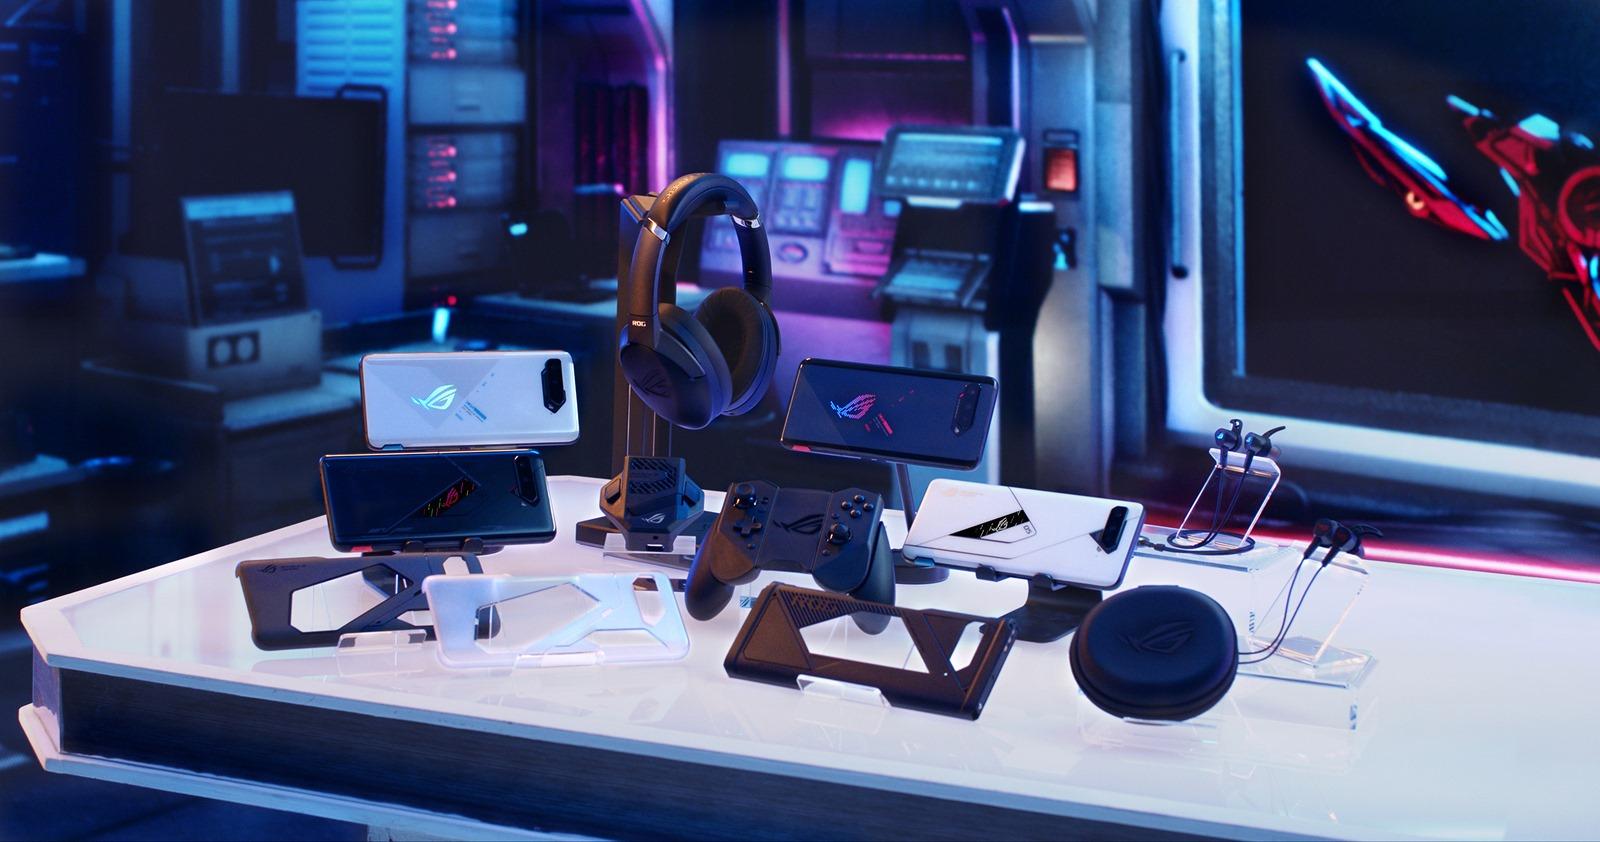 ROG 玩家共和國發表「地表最強電競手機」-ROG-Phone-5、ROG-Phone-5-Pro/Ultimate 及多款配件。.jpg @3C 達人廖阿輝